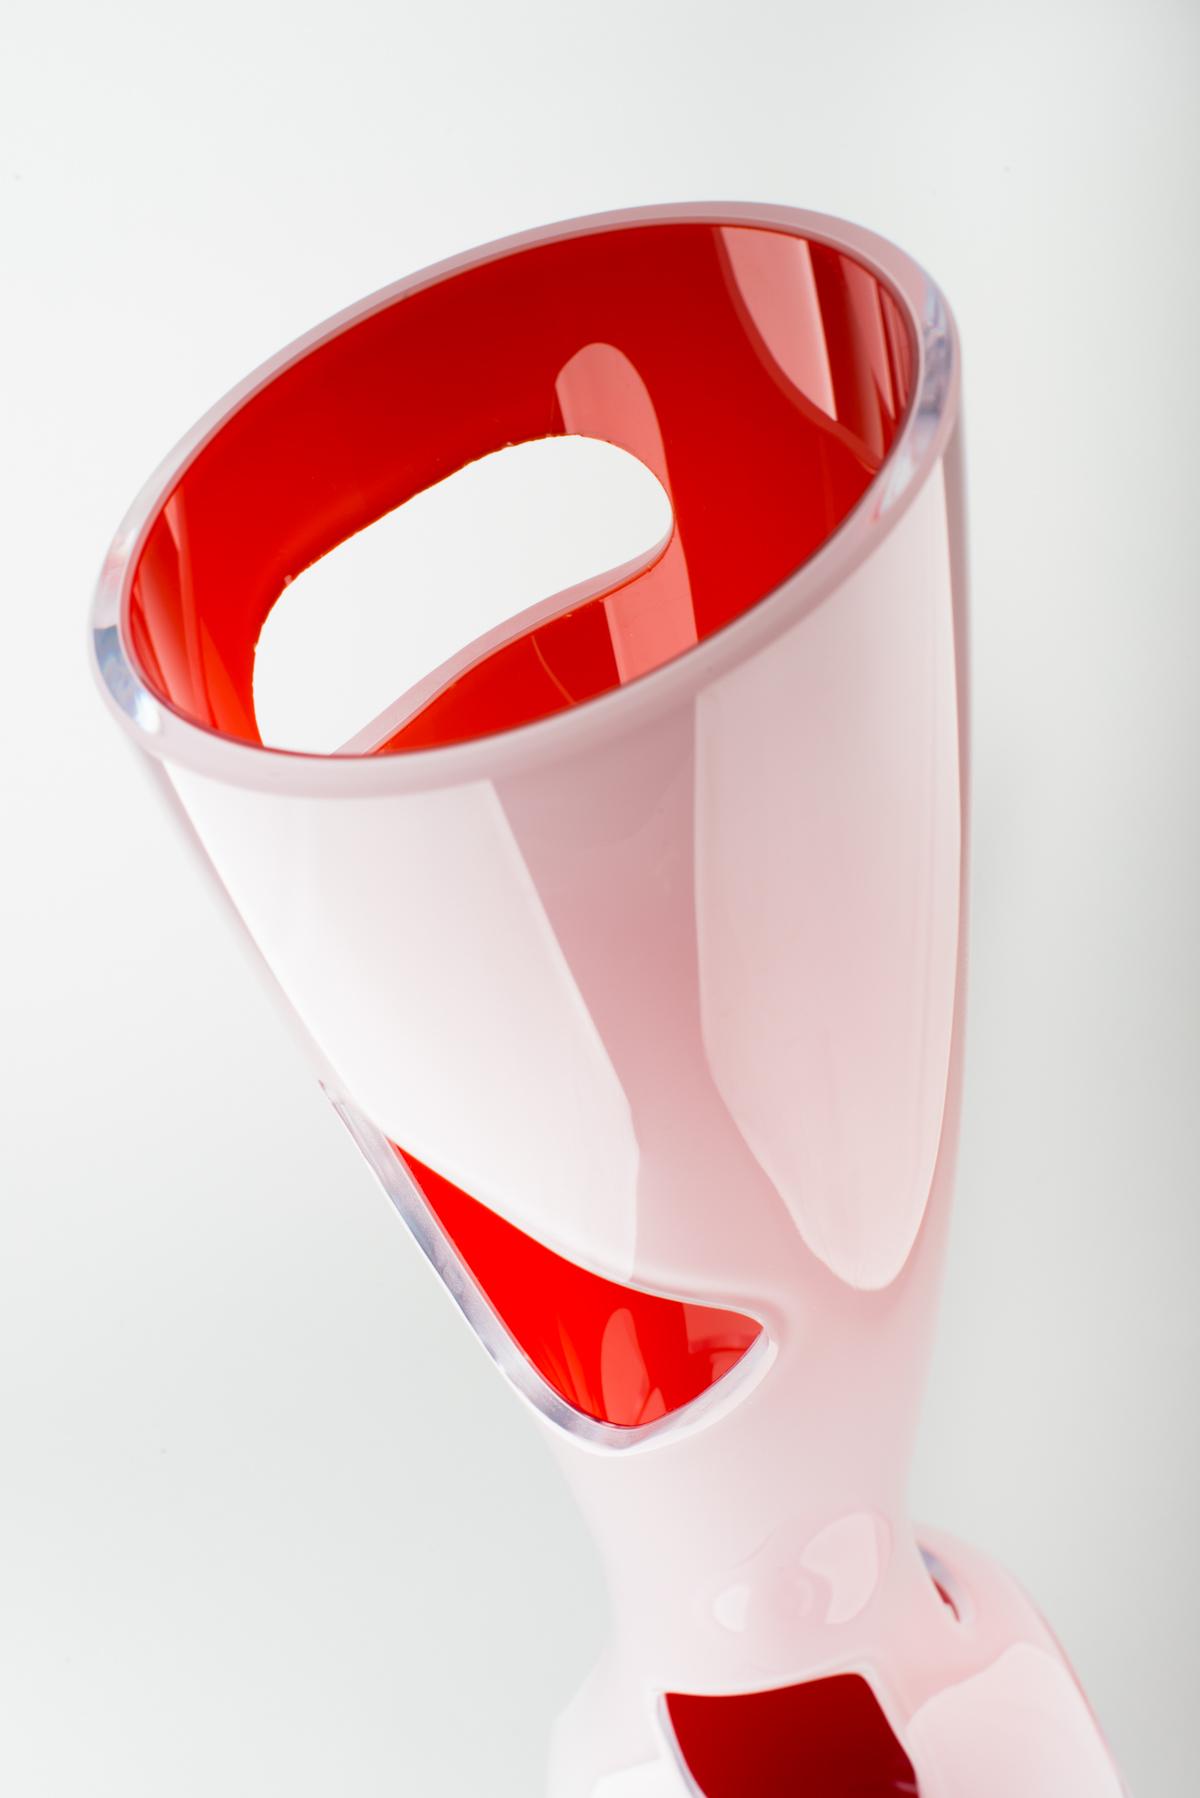 un-vase-reda-amalou-murano-glass-veronese-2.jpg